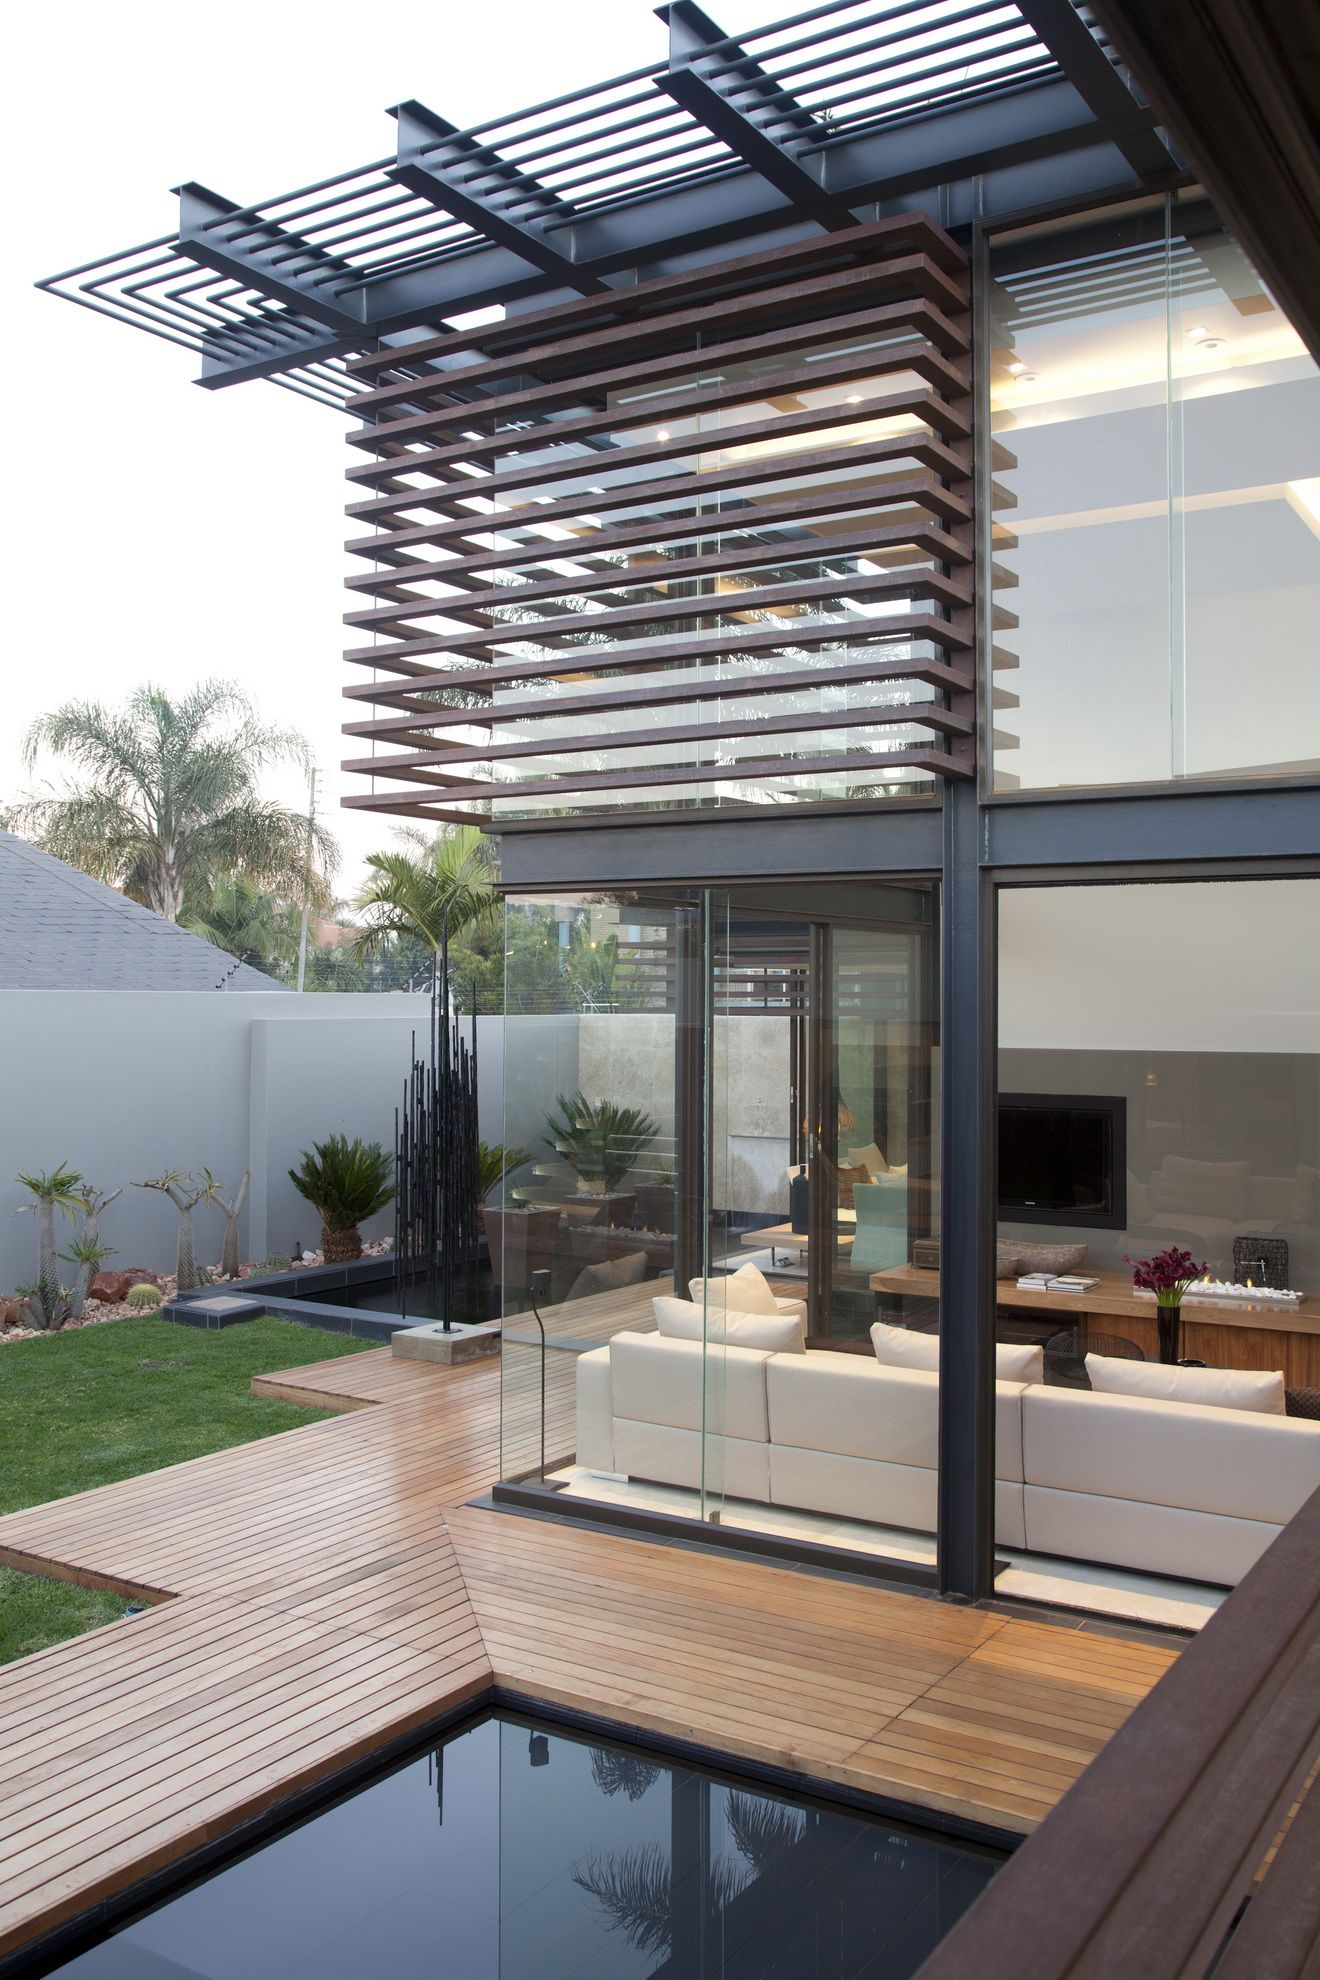 House Abo | Exterior | Nico van der Meulen Architects #Design #Architecture #Contemporary